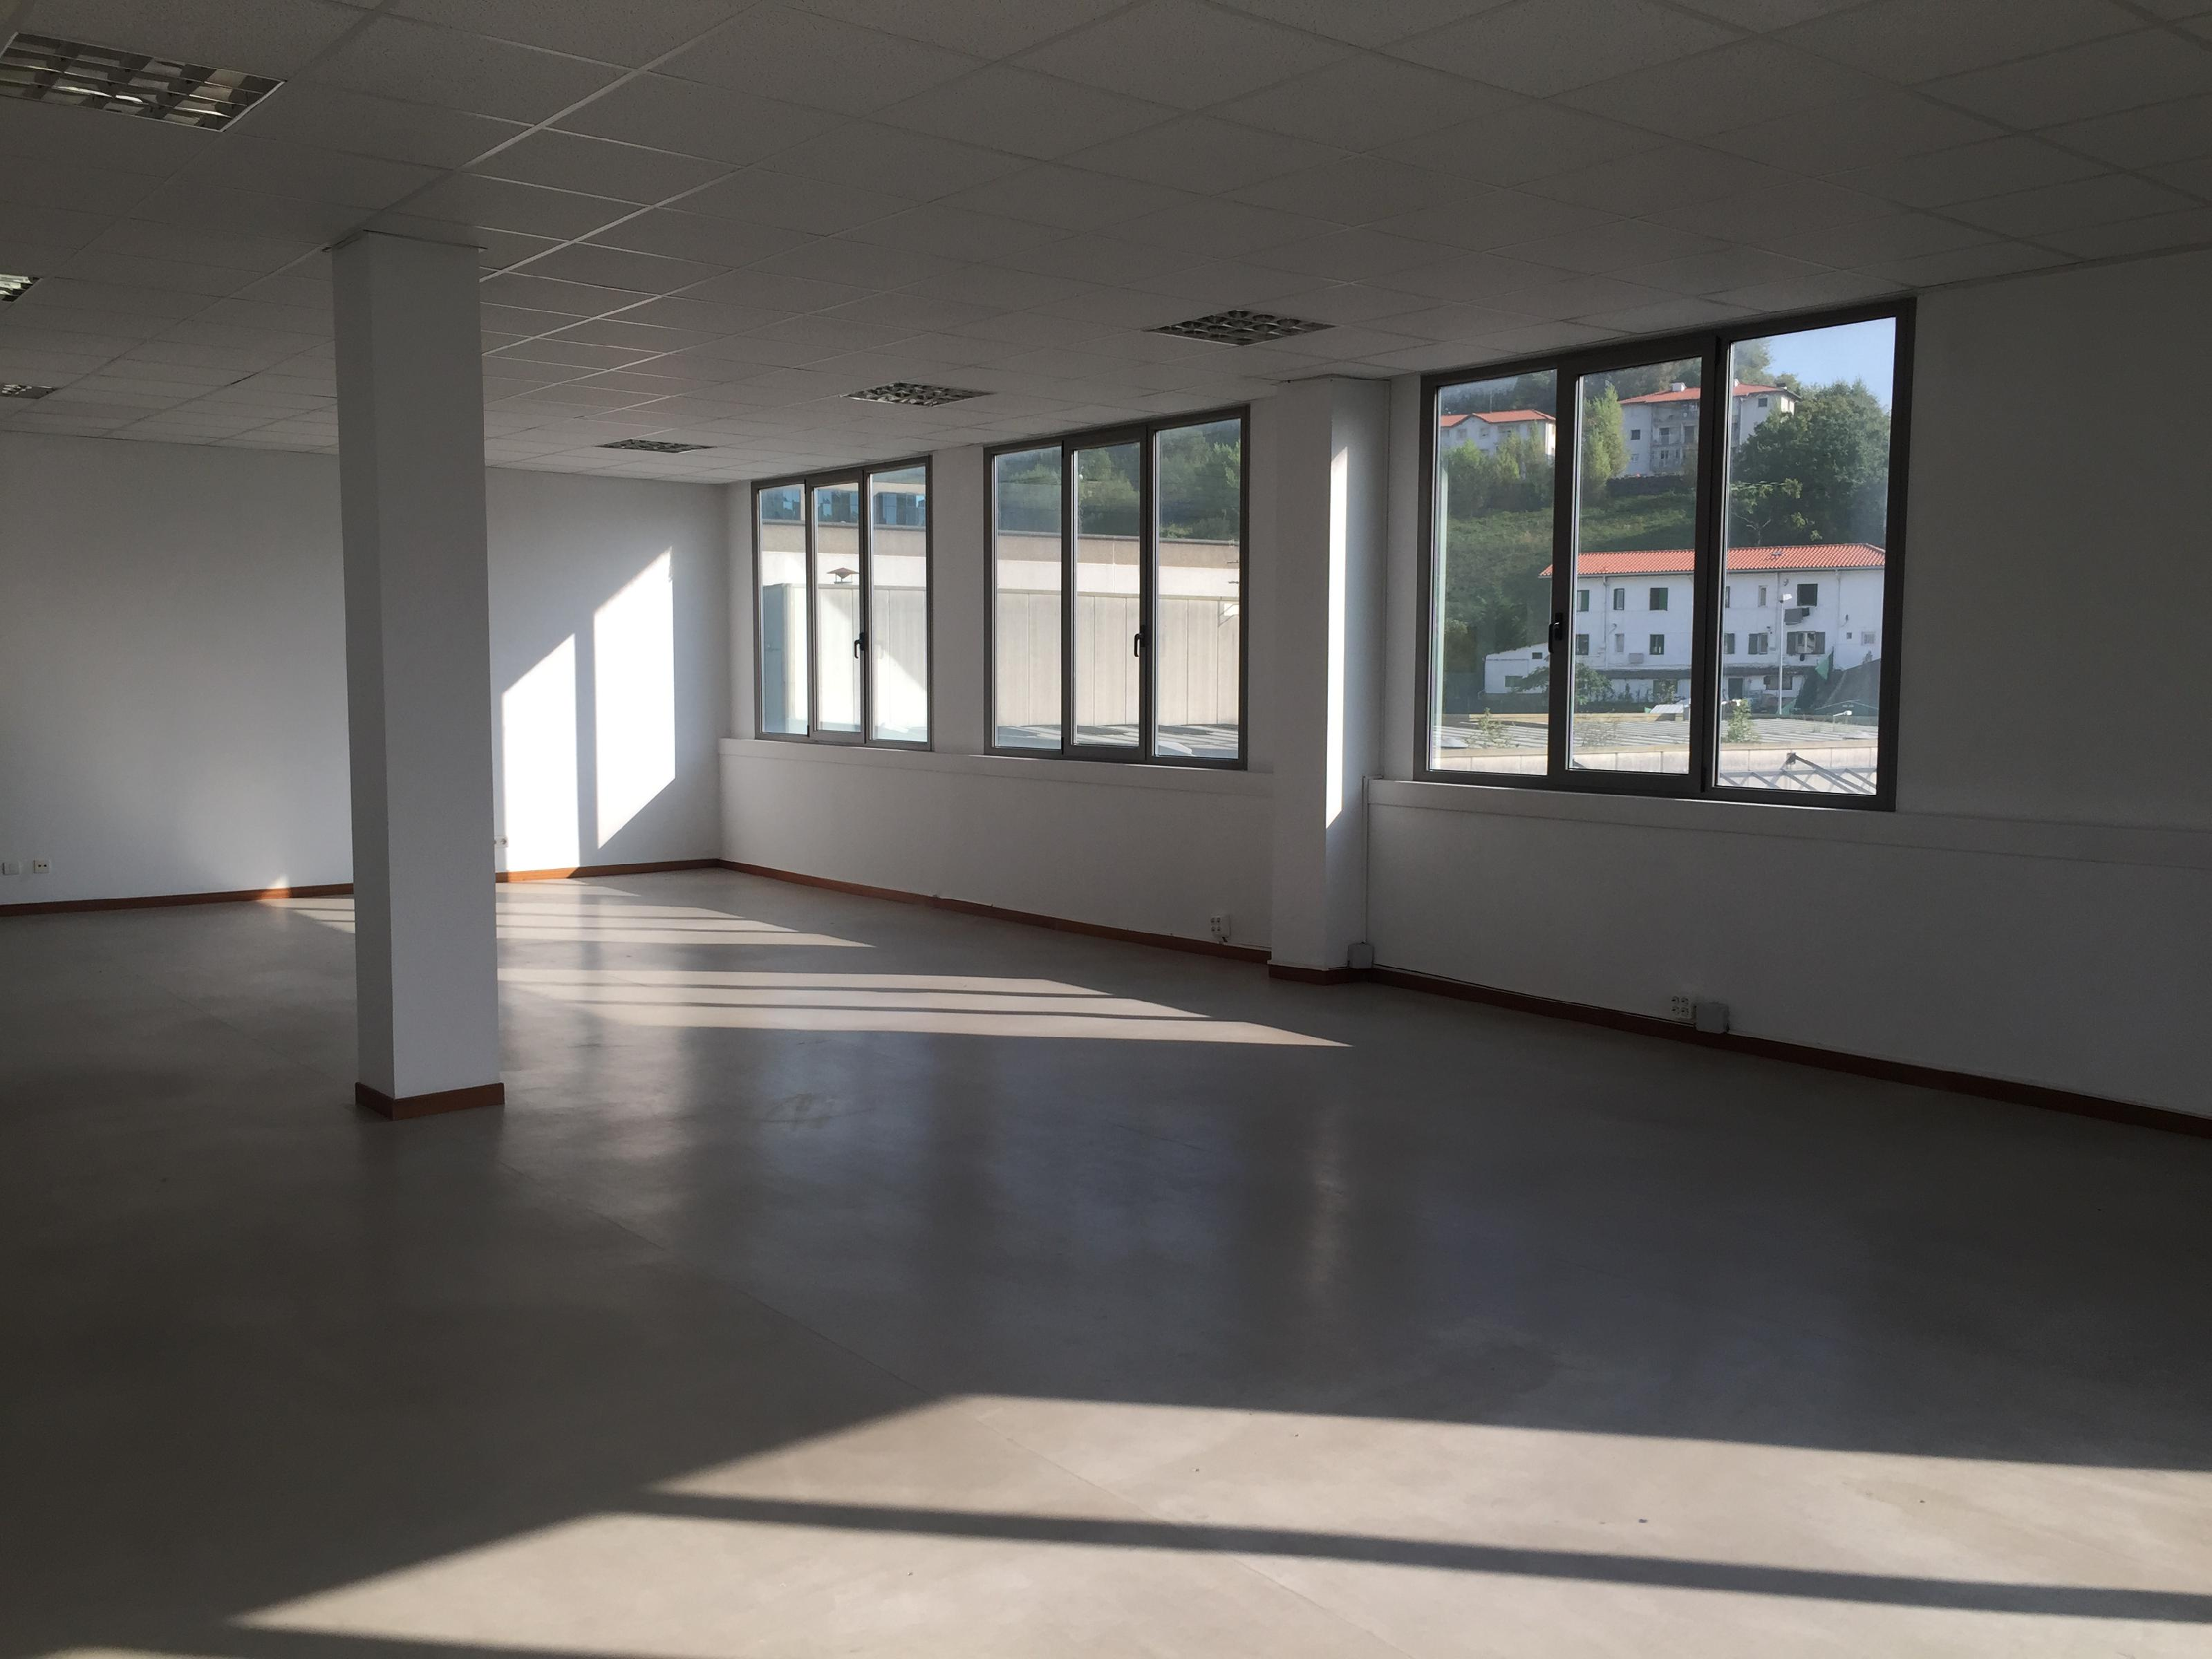 Imagen 1 Oficina Comercial en venta en San Sebastián / Polígono de Igara, Donostia